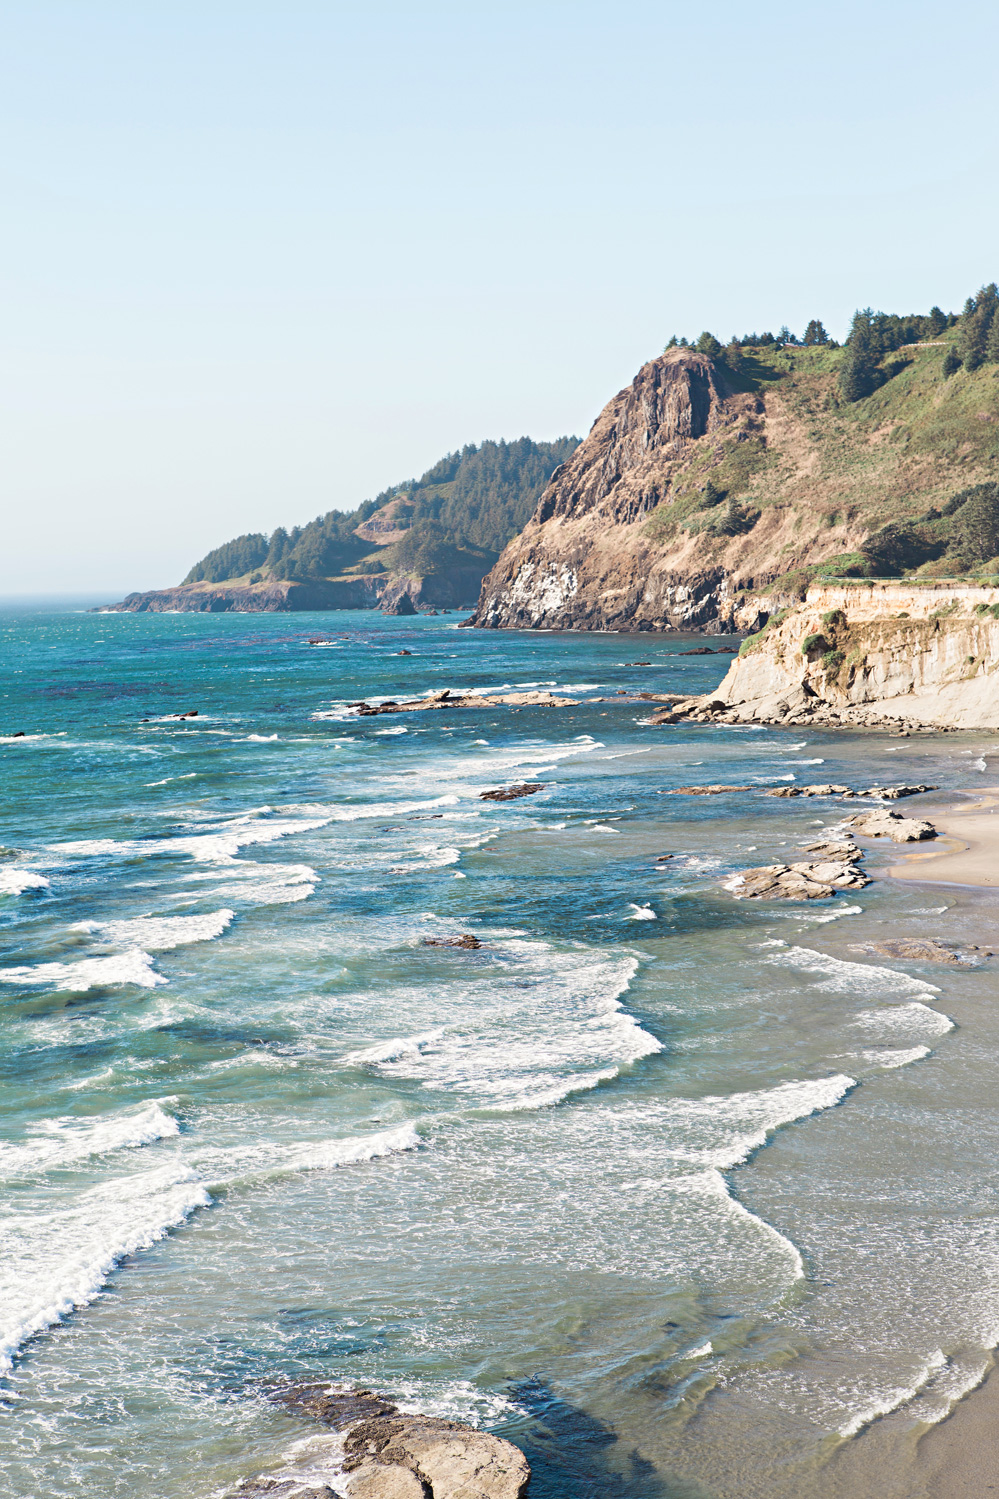 CindyGiovagnoli_Crater_Lake_National_Park_Cape_Perpetua_Heceta_Head_lighthouse_Pacific_Ocean_Cannon_Beach_haystack_Oregon_coast-023.jpg